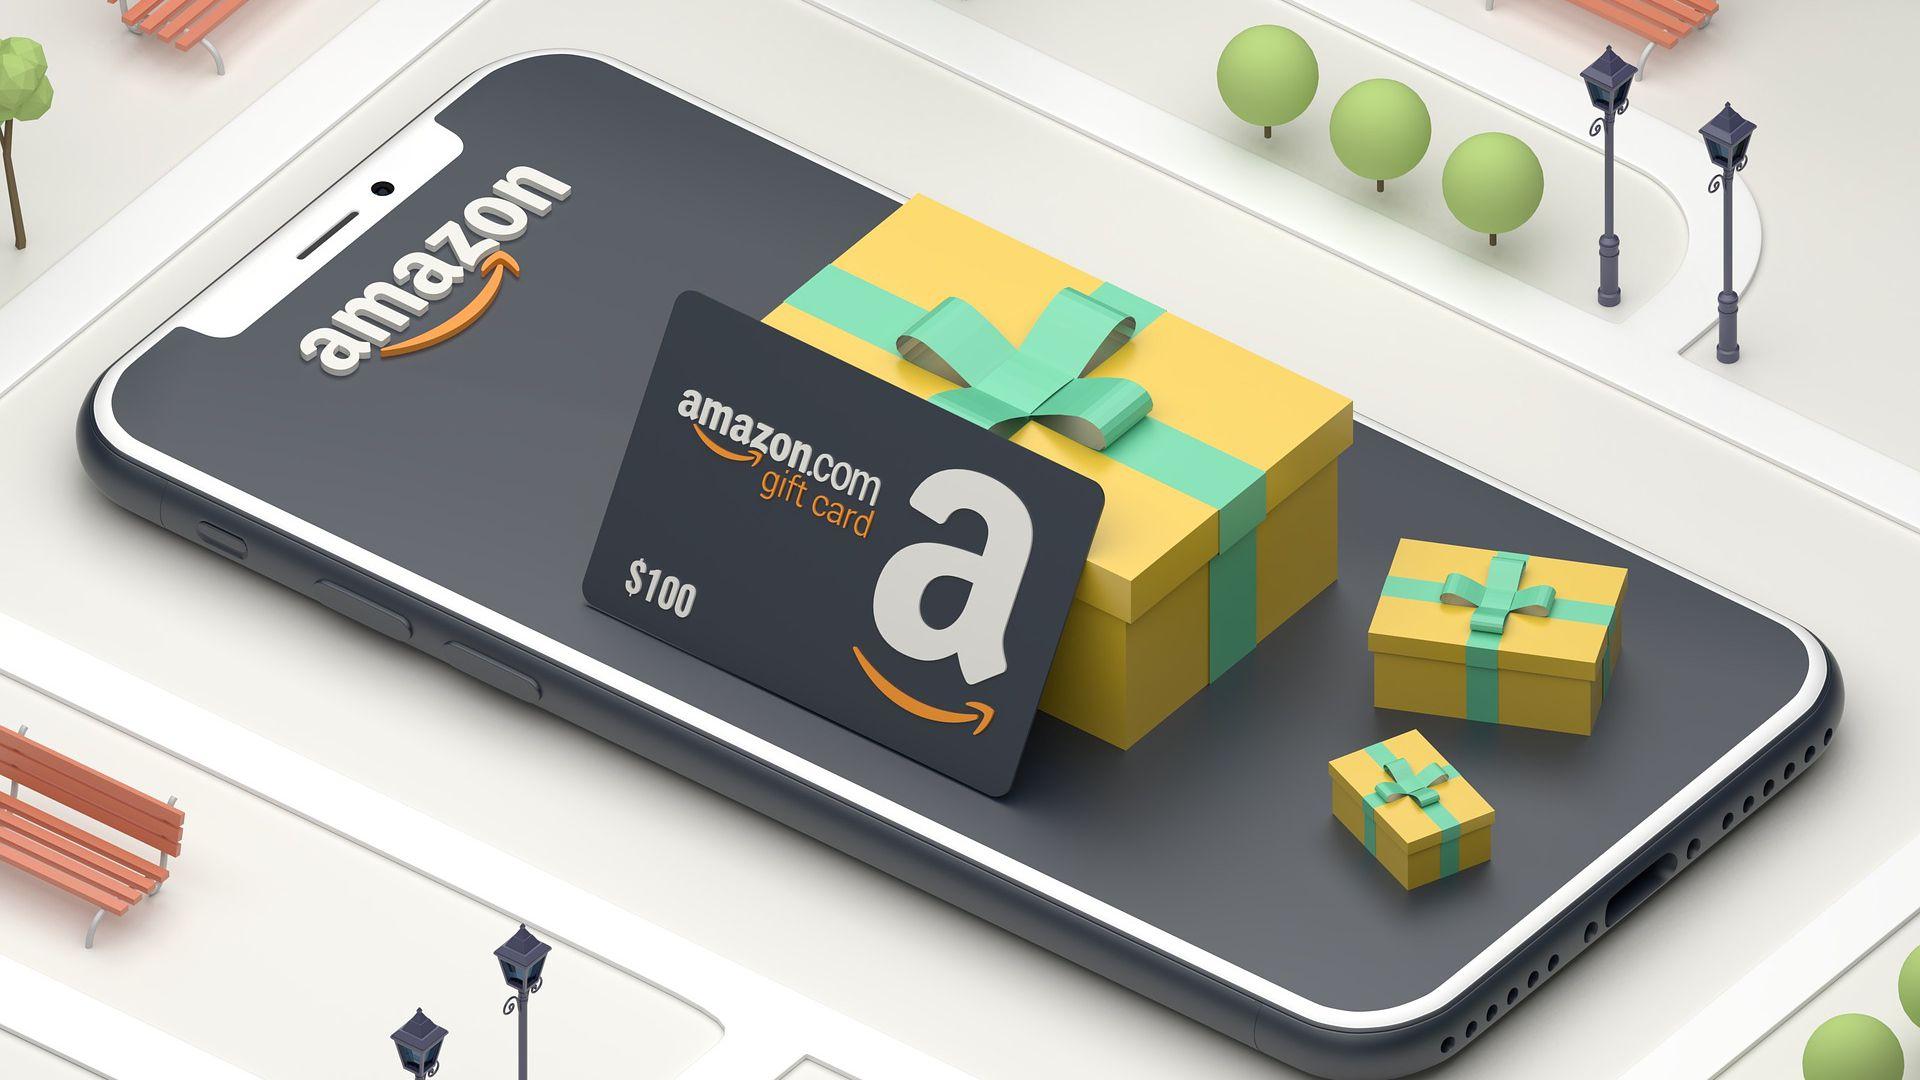 Amazondan Para Kazanmak